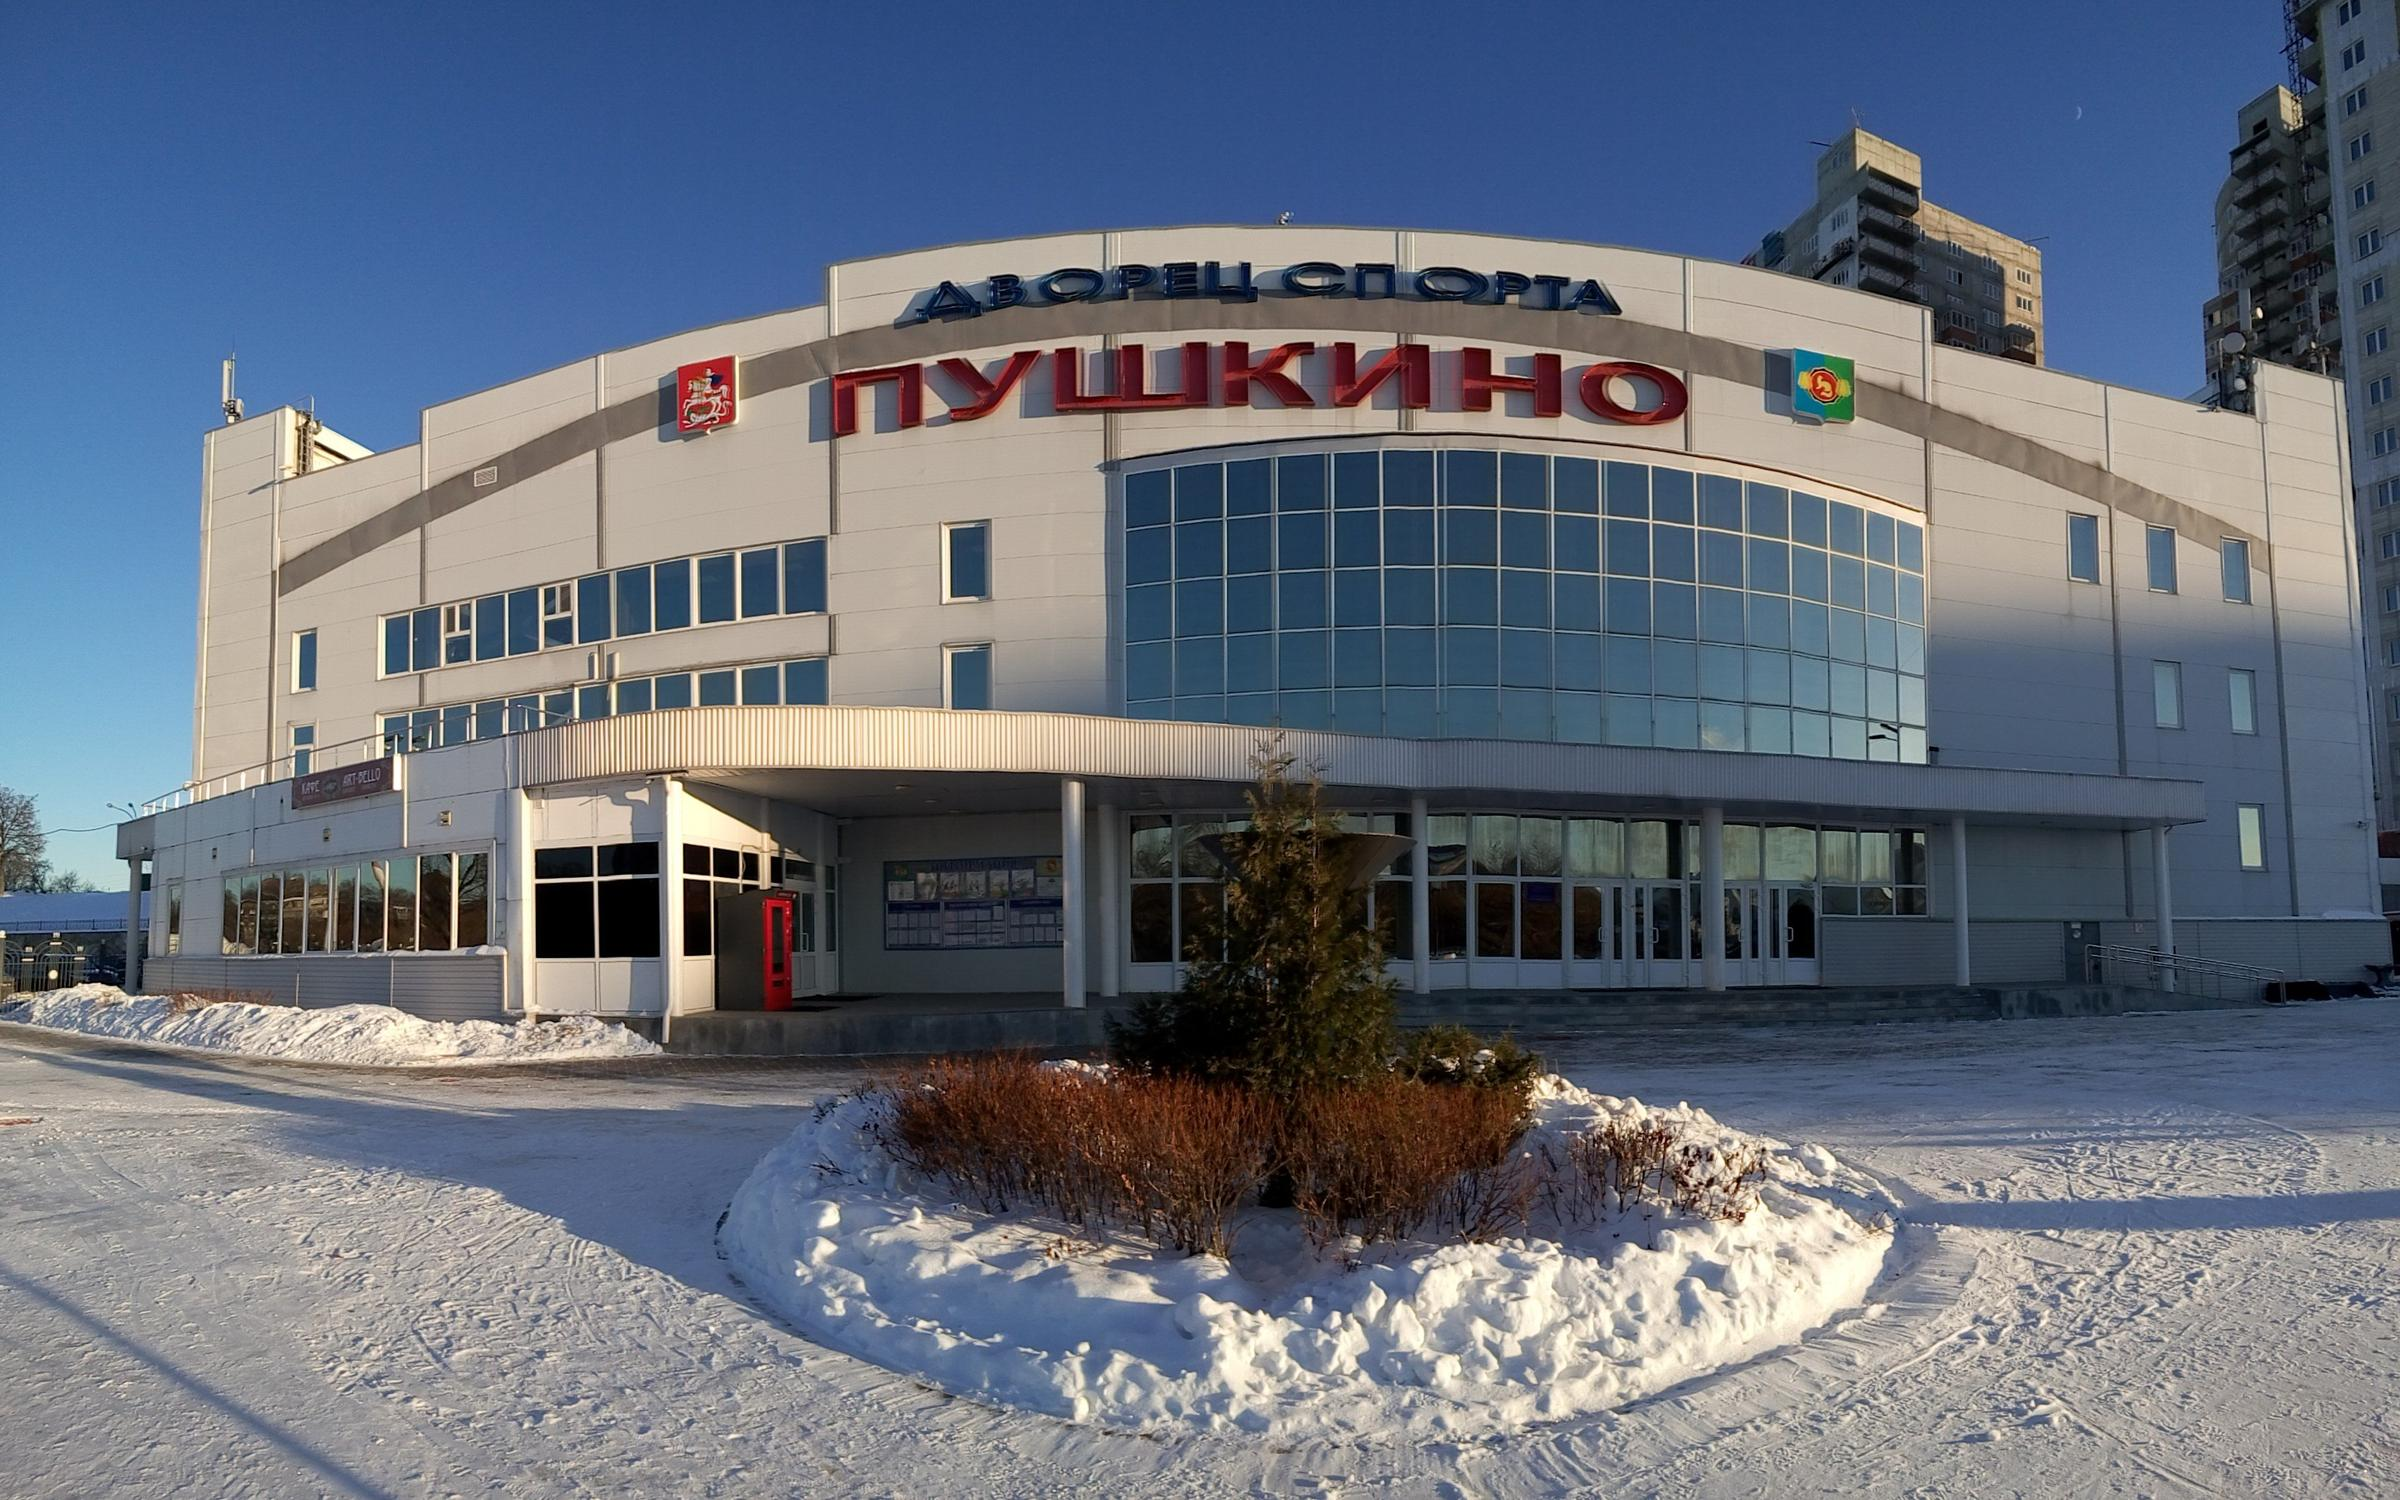 фотография МБУ ПМРМО Дворец спорта Пушкино